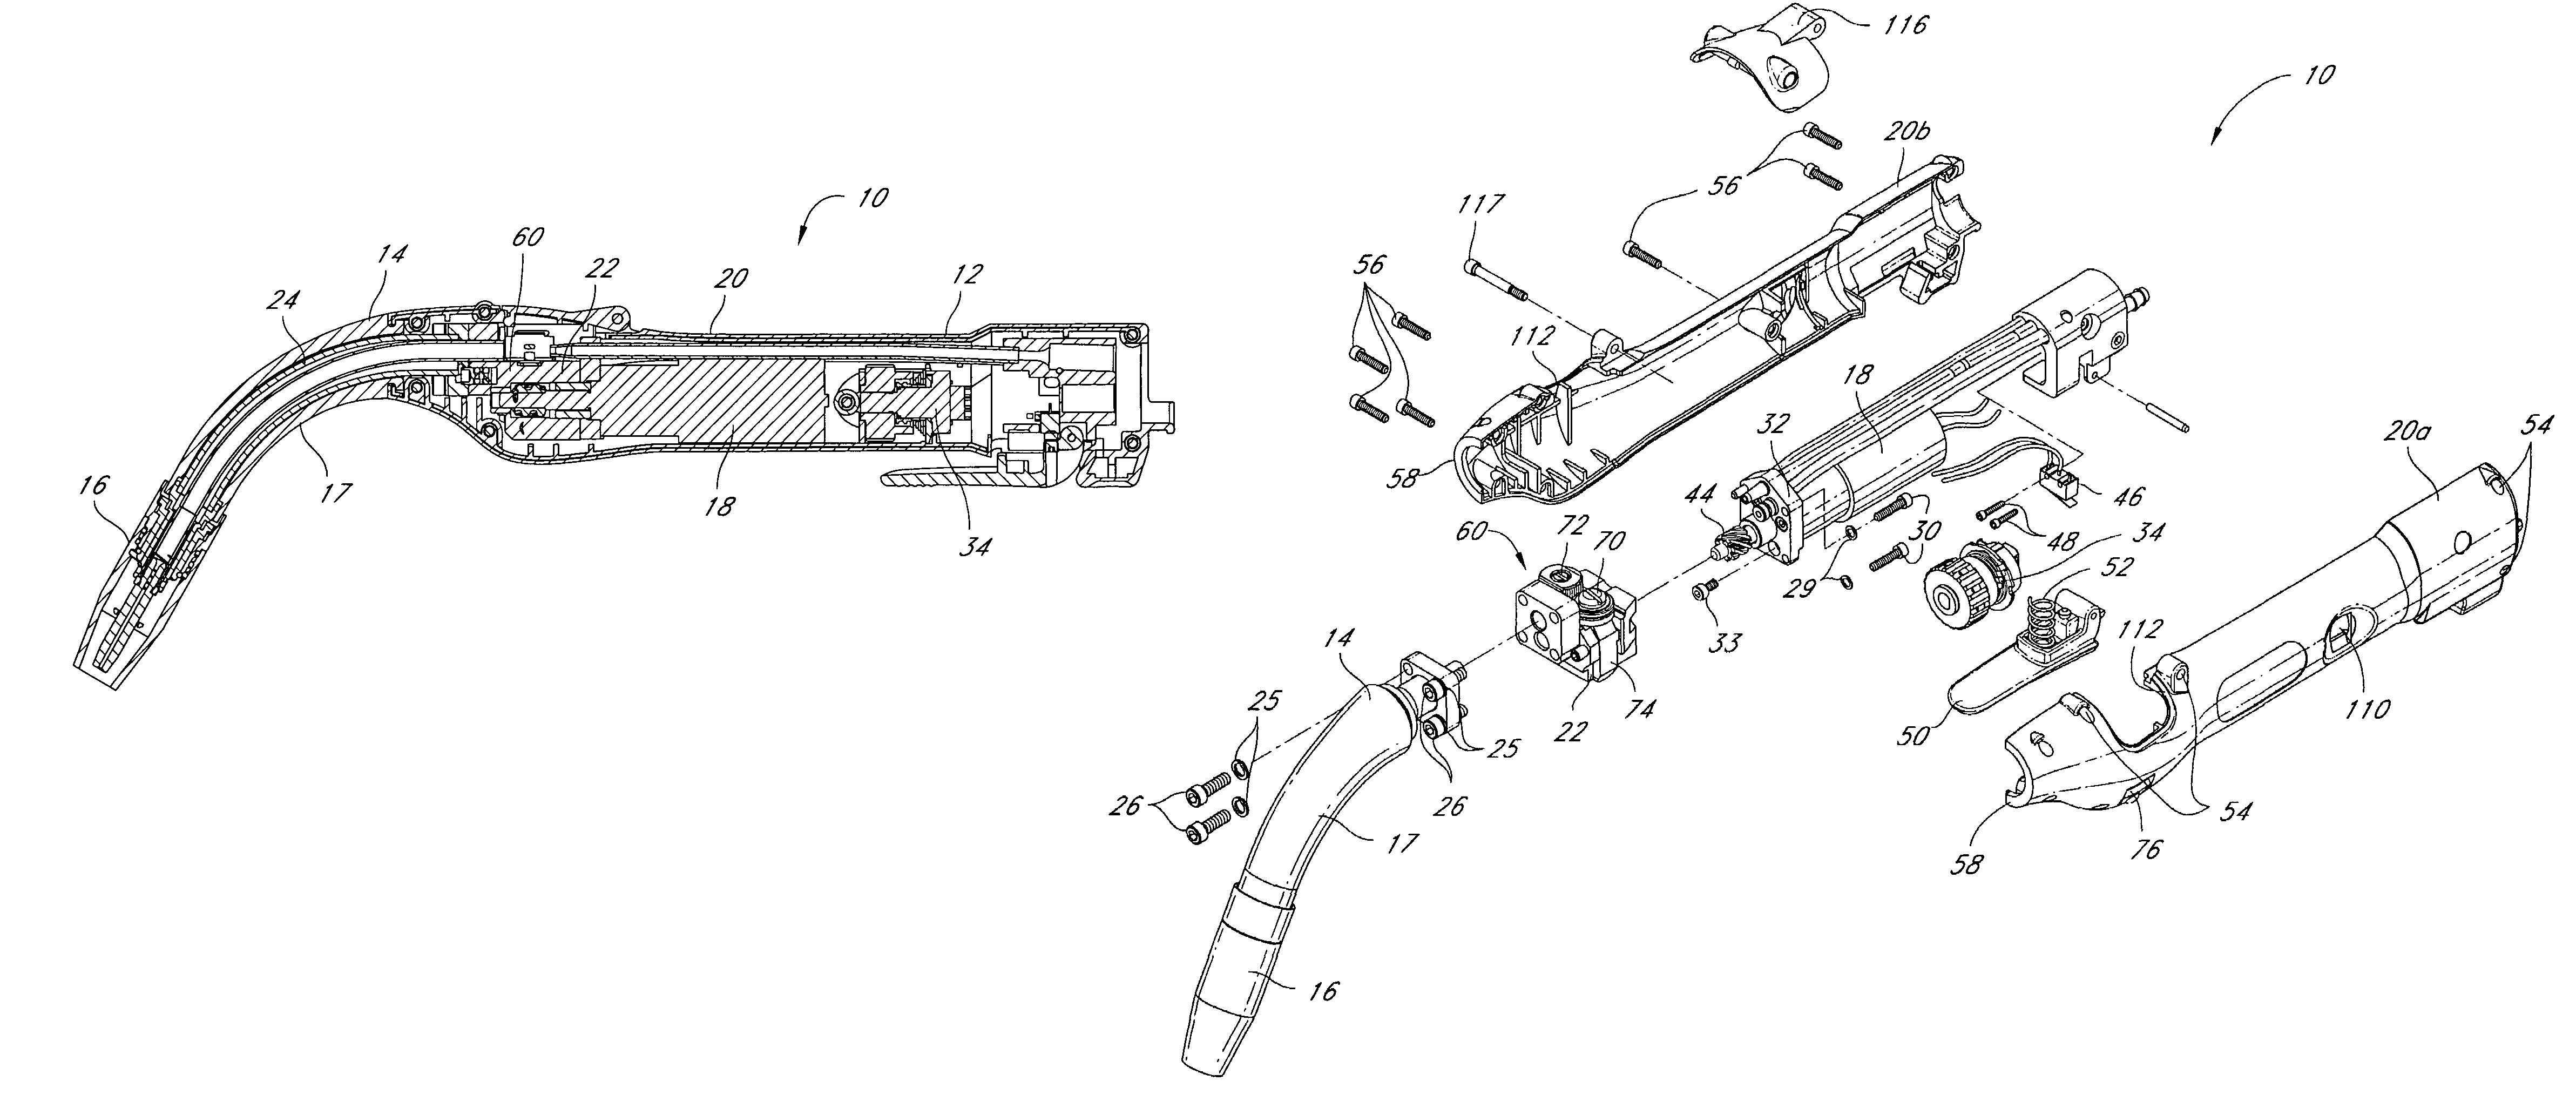 patent us7244909 - welding gun